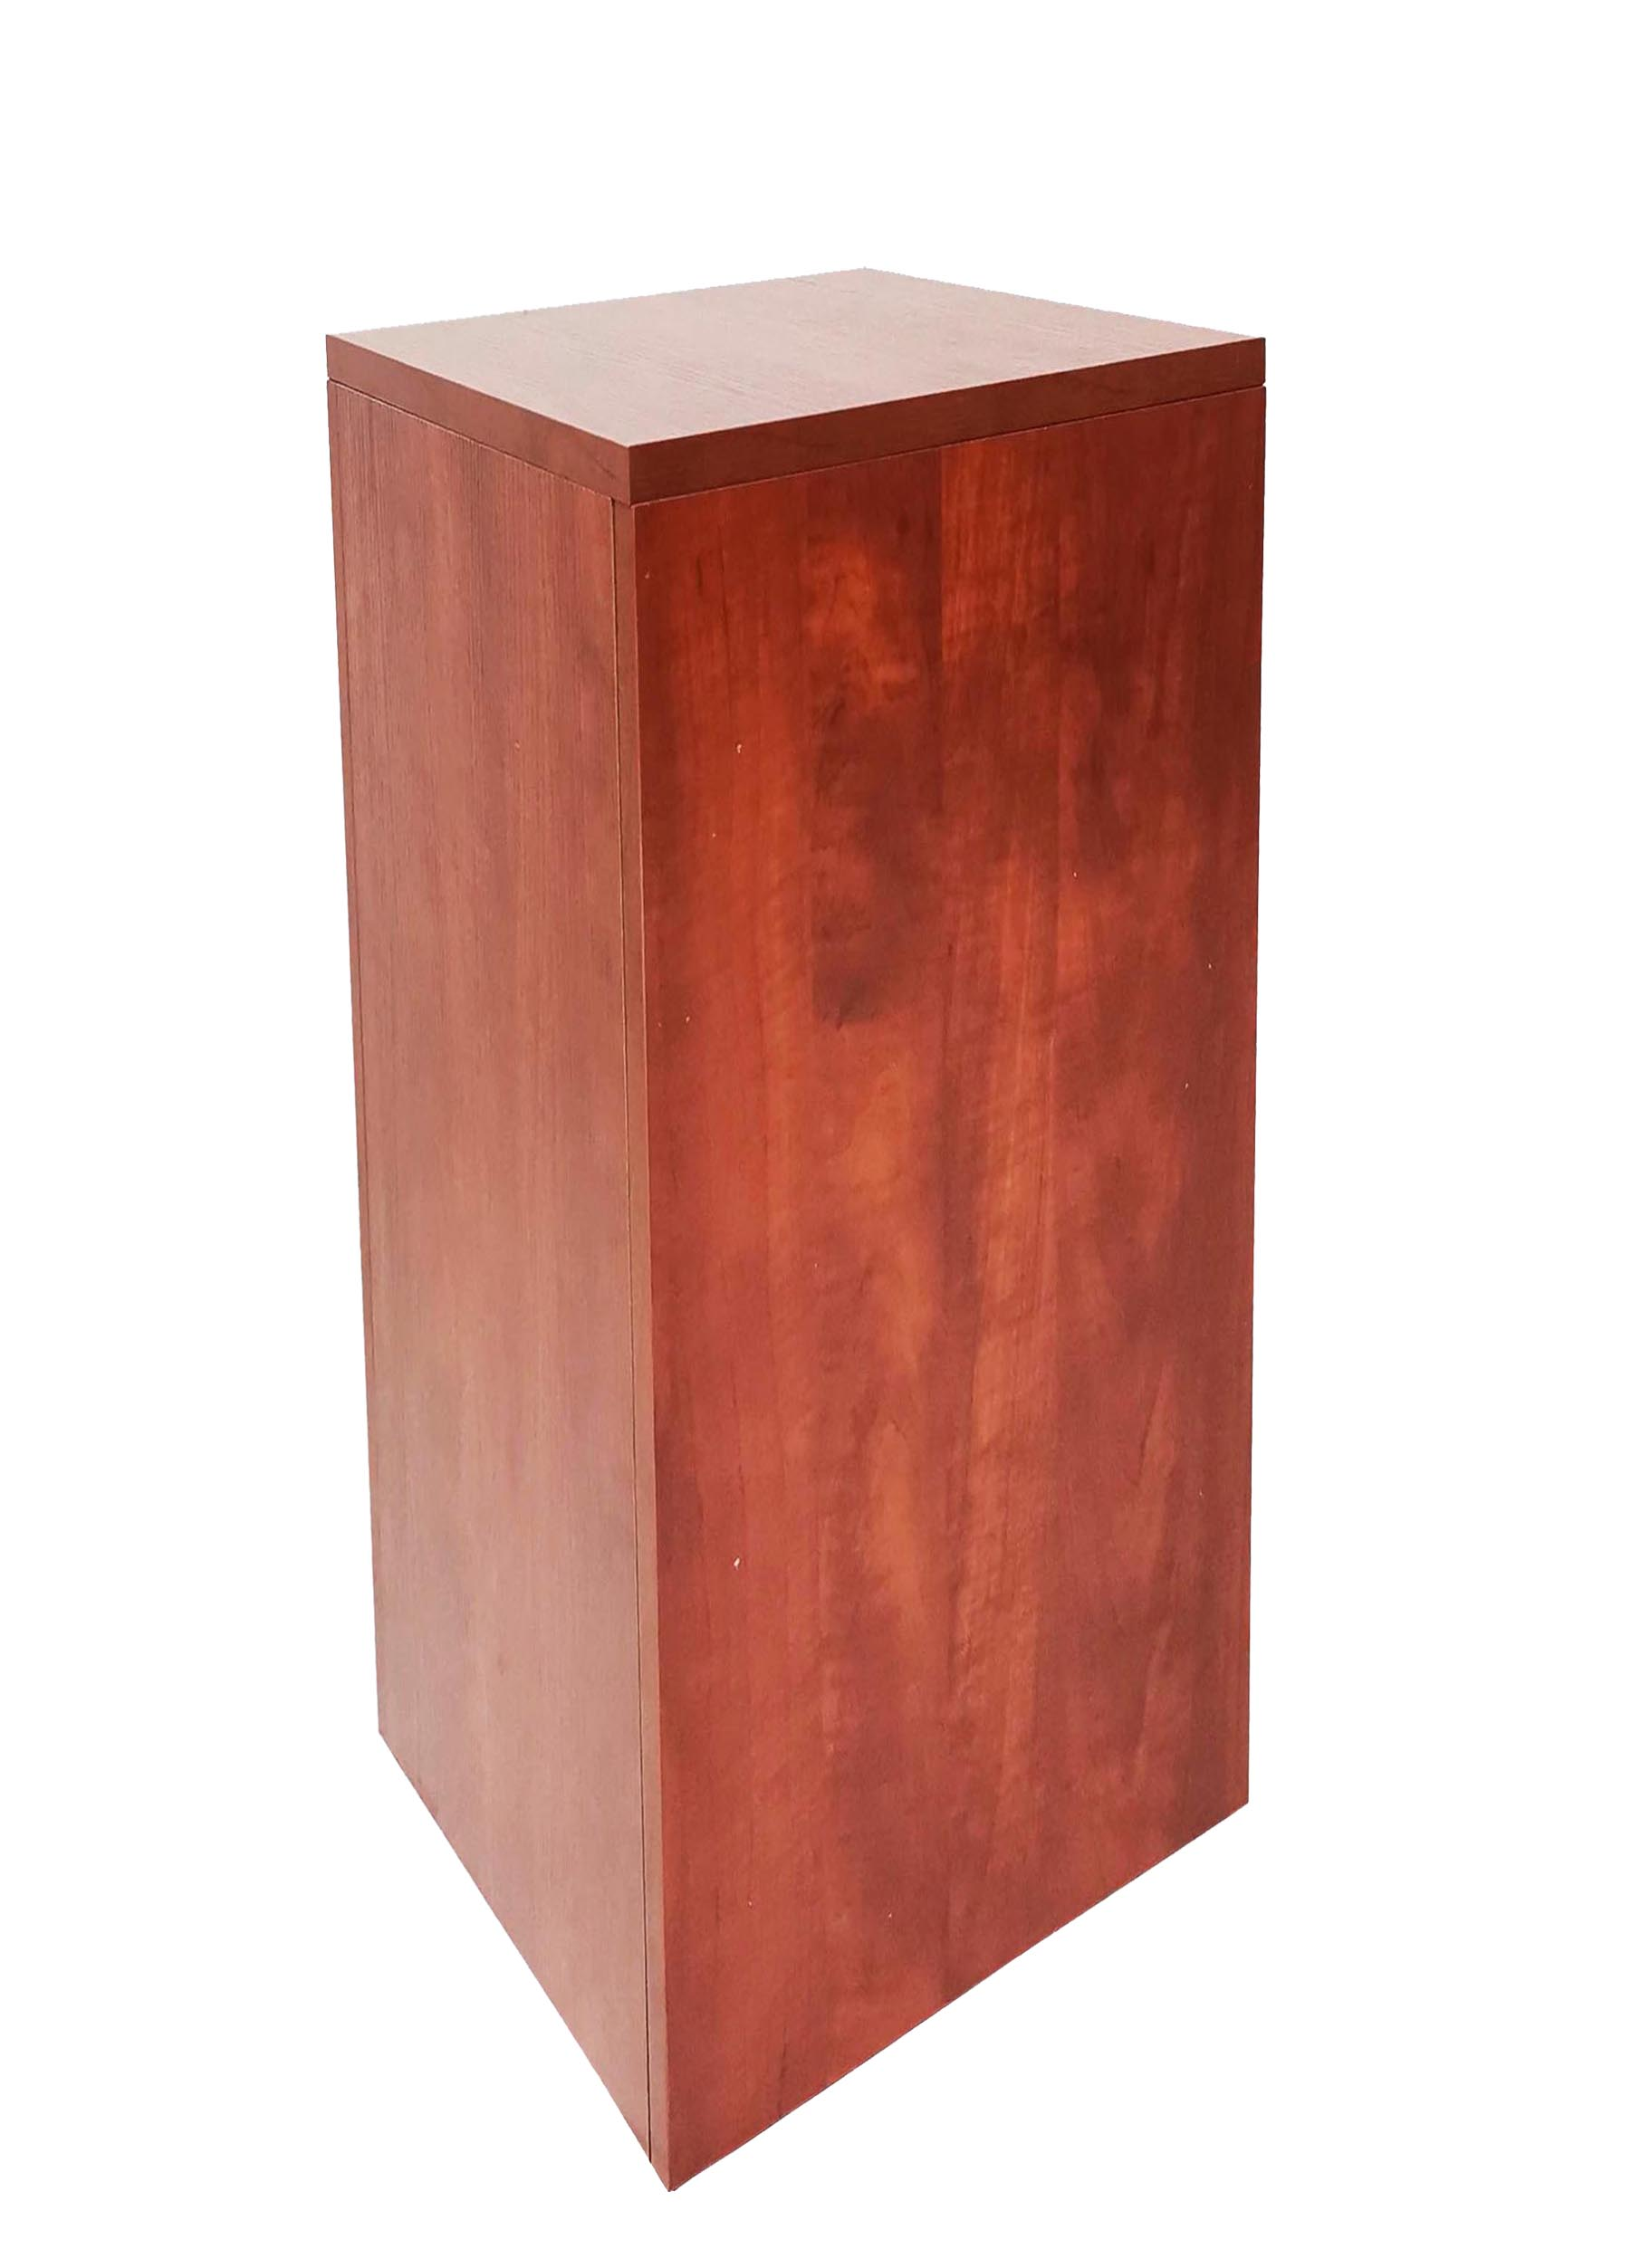 Cube Wood Pedestal Cube Display Storage Dump Cube Bin Wood